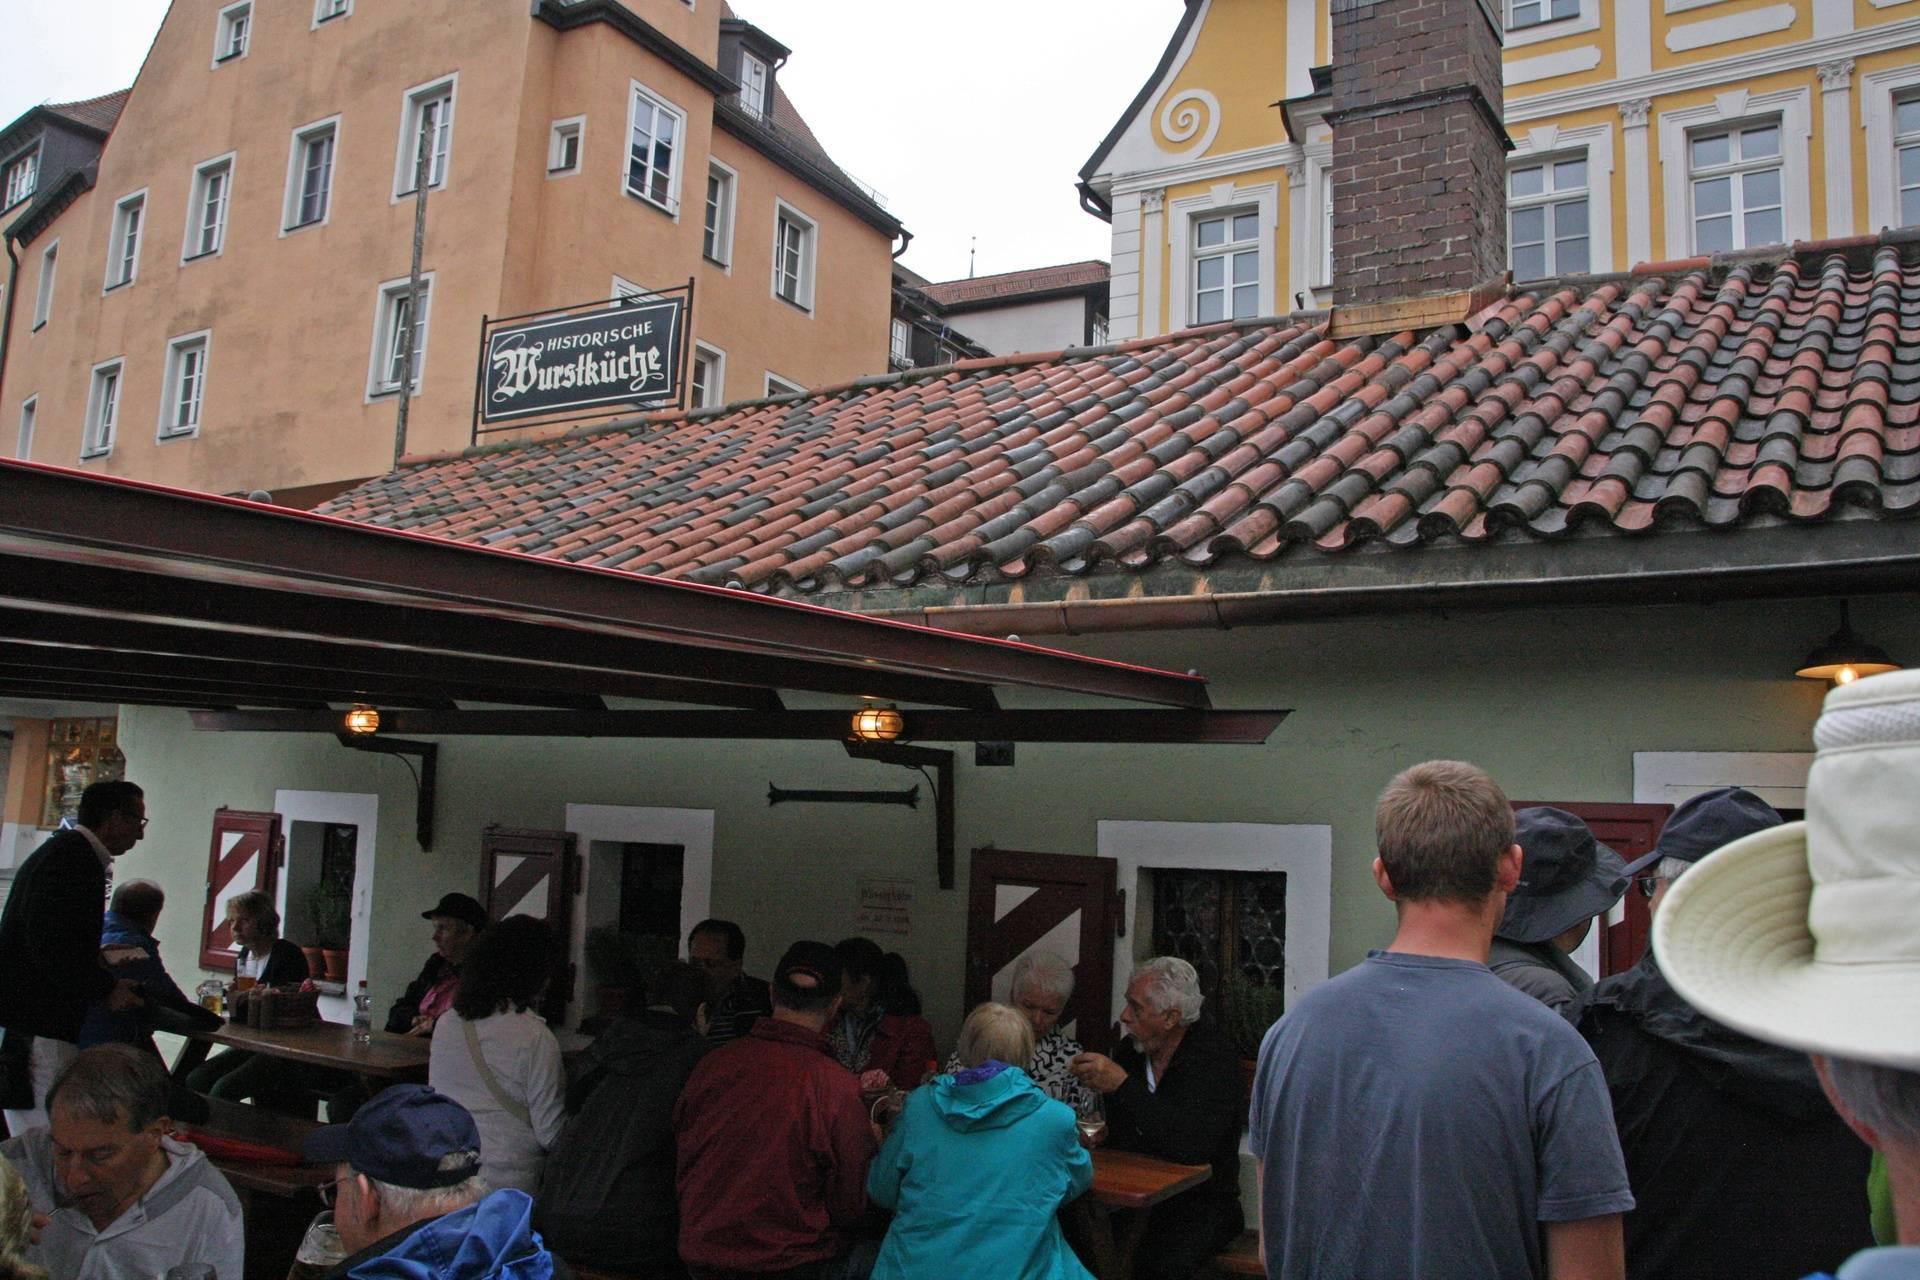 Sausage Restaurant in Regensburg (900 years old)